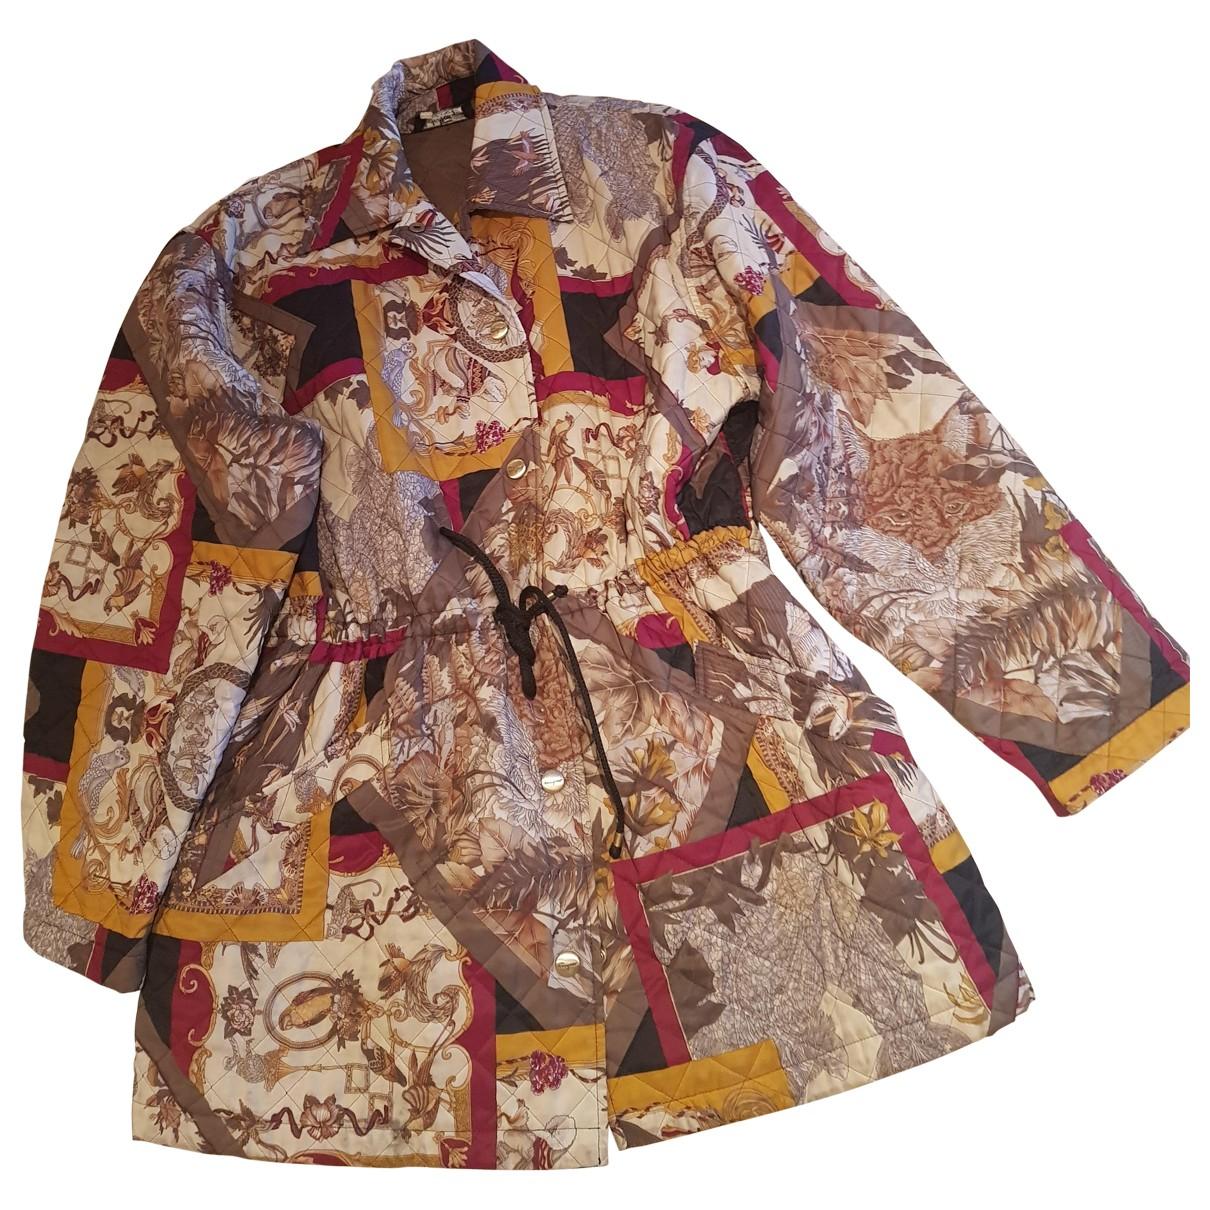 Salvatore Ferragamo N Trench coat for Women L International